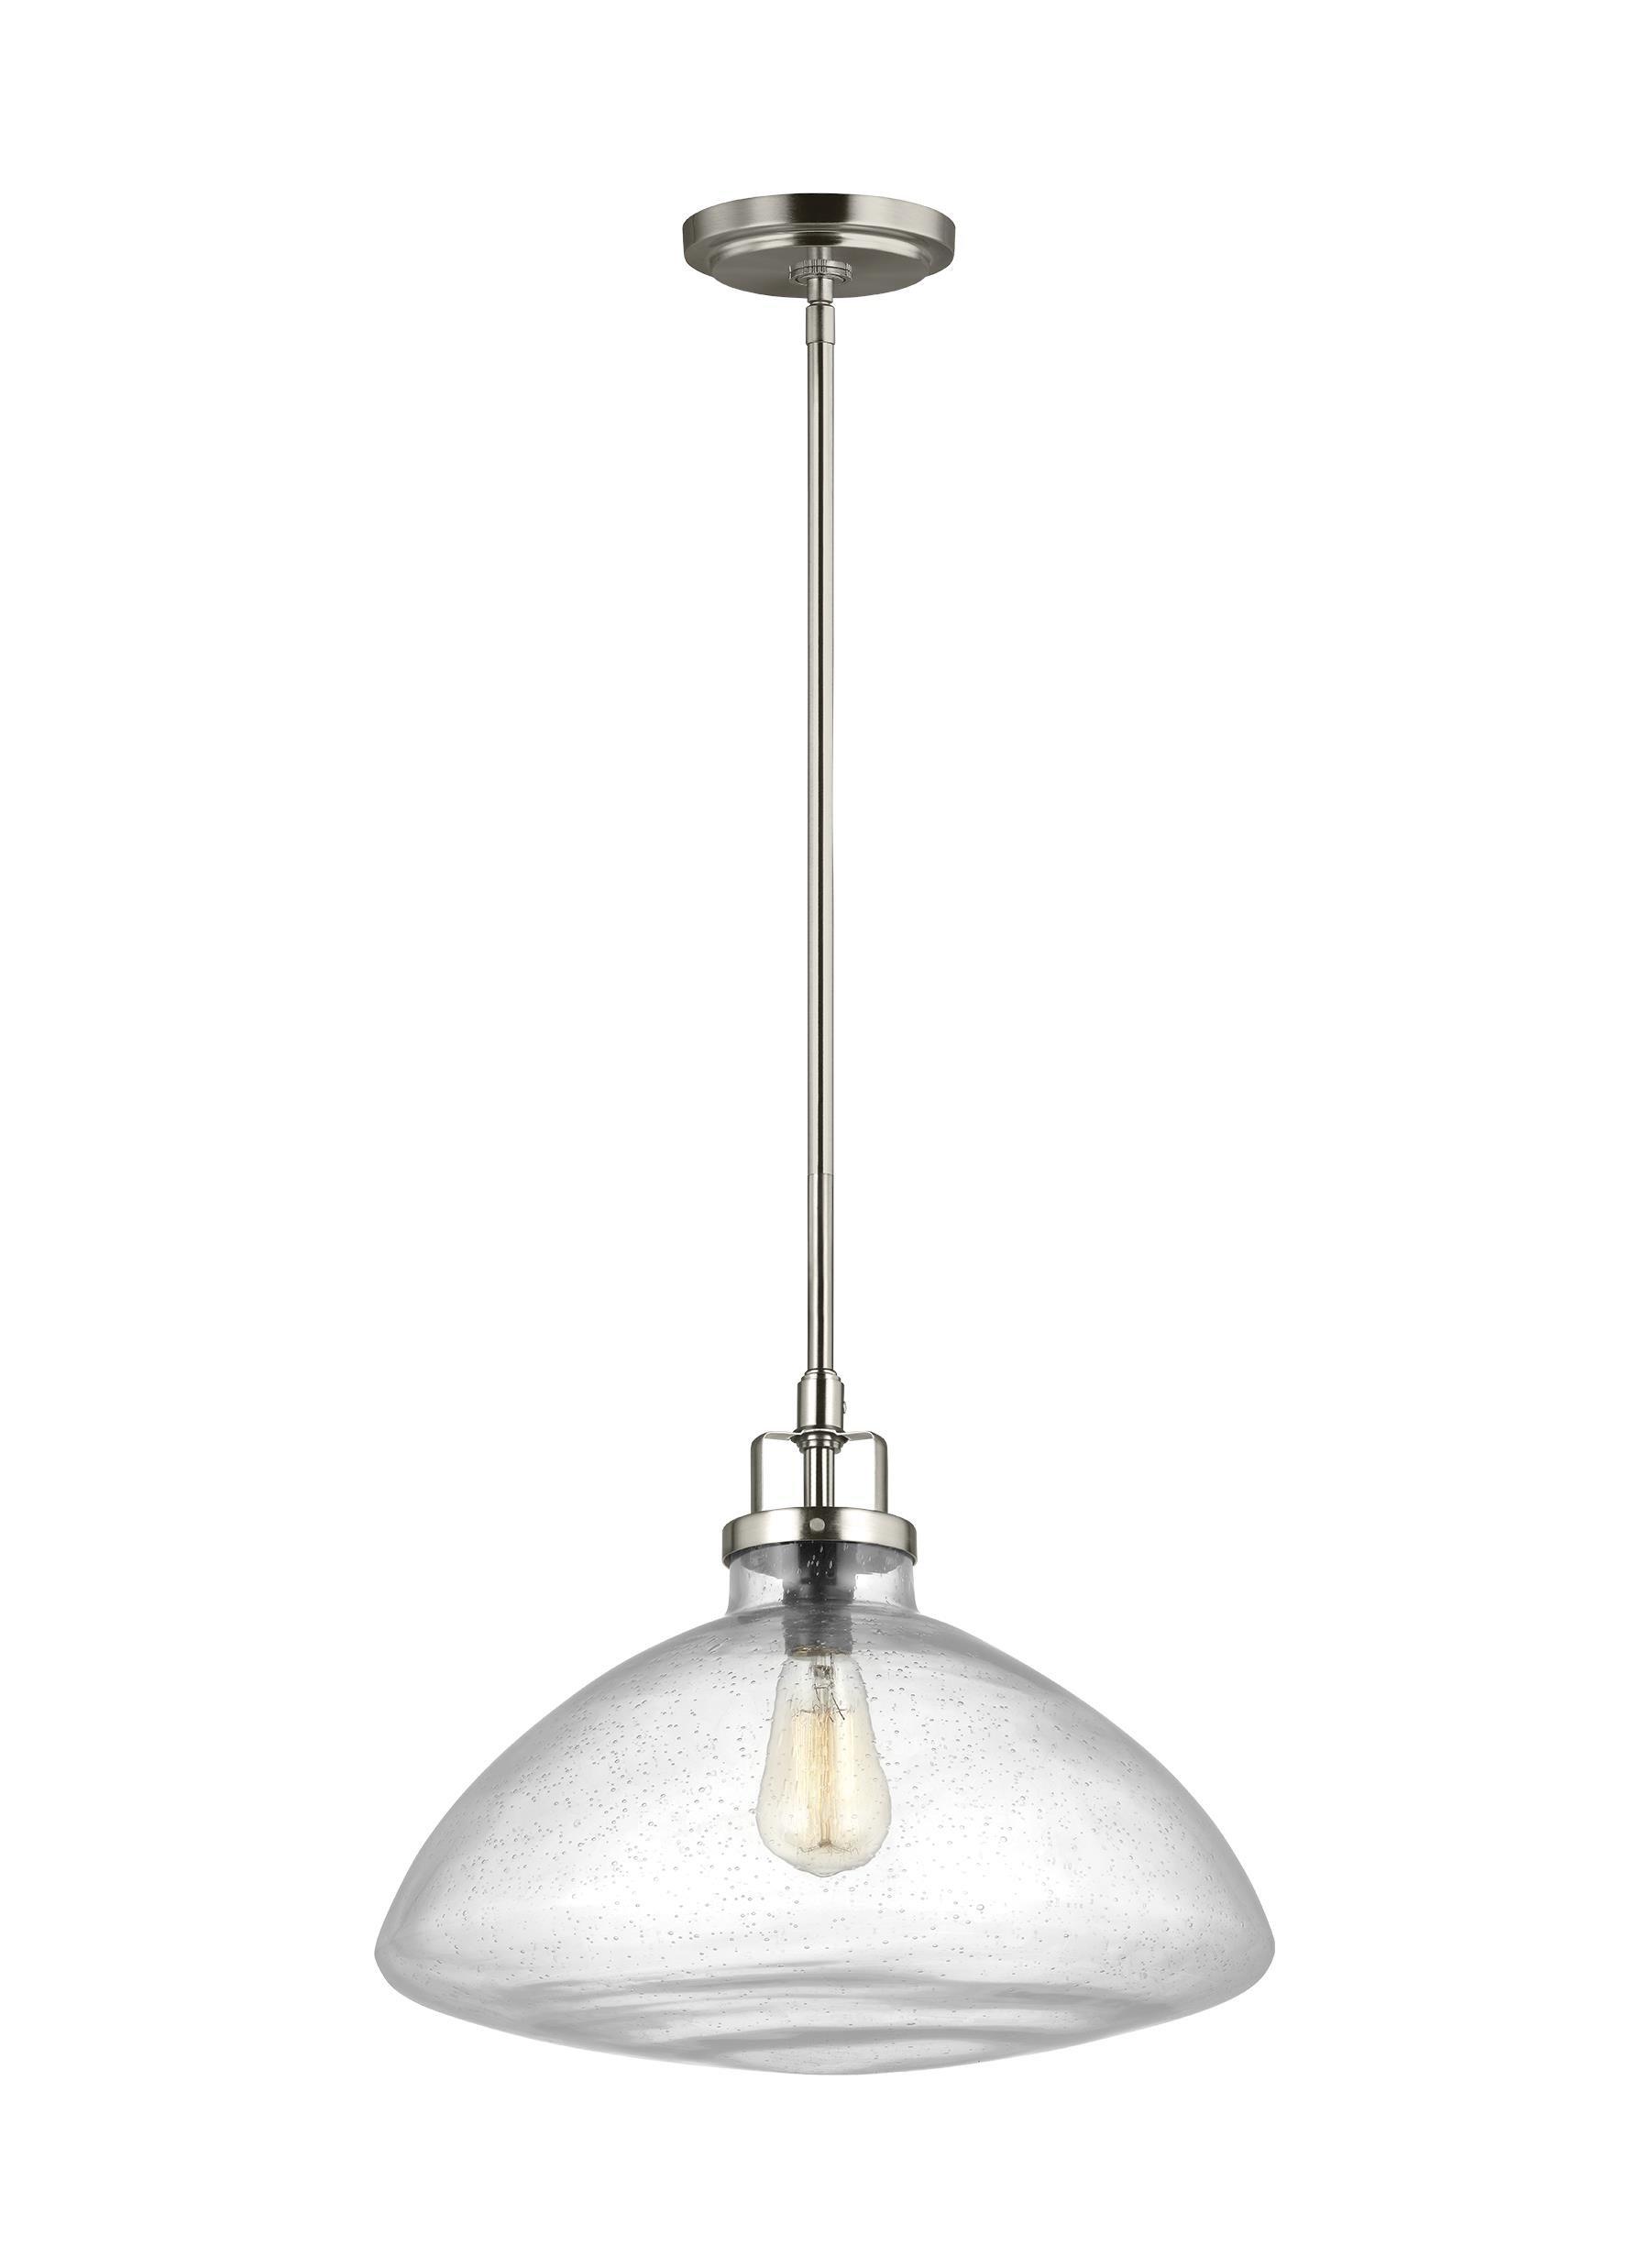 Houon 1-Light Single Schoolhouse Pendant intended for Granville 2-Light Single Dome Pendants (Image 22 of 30)